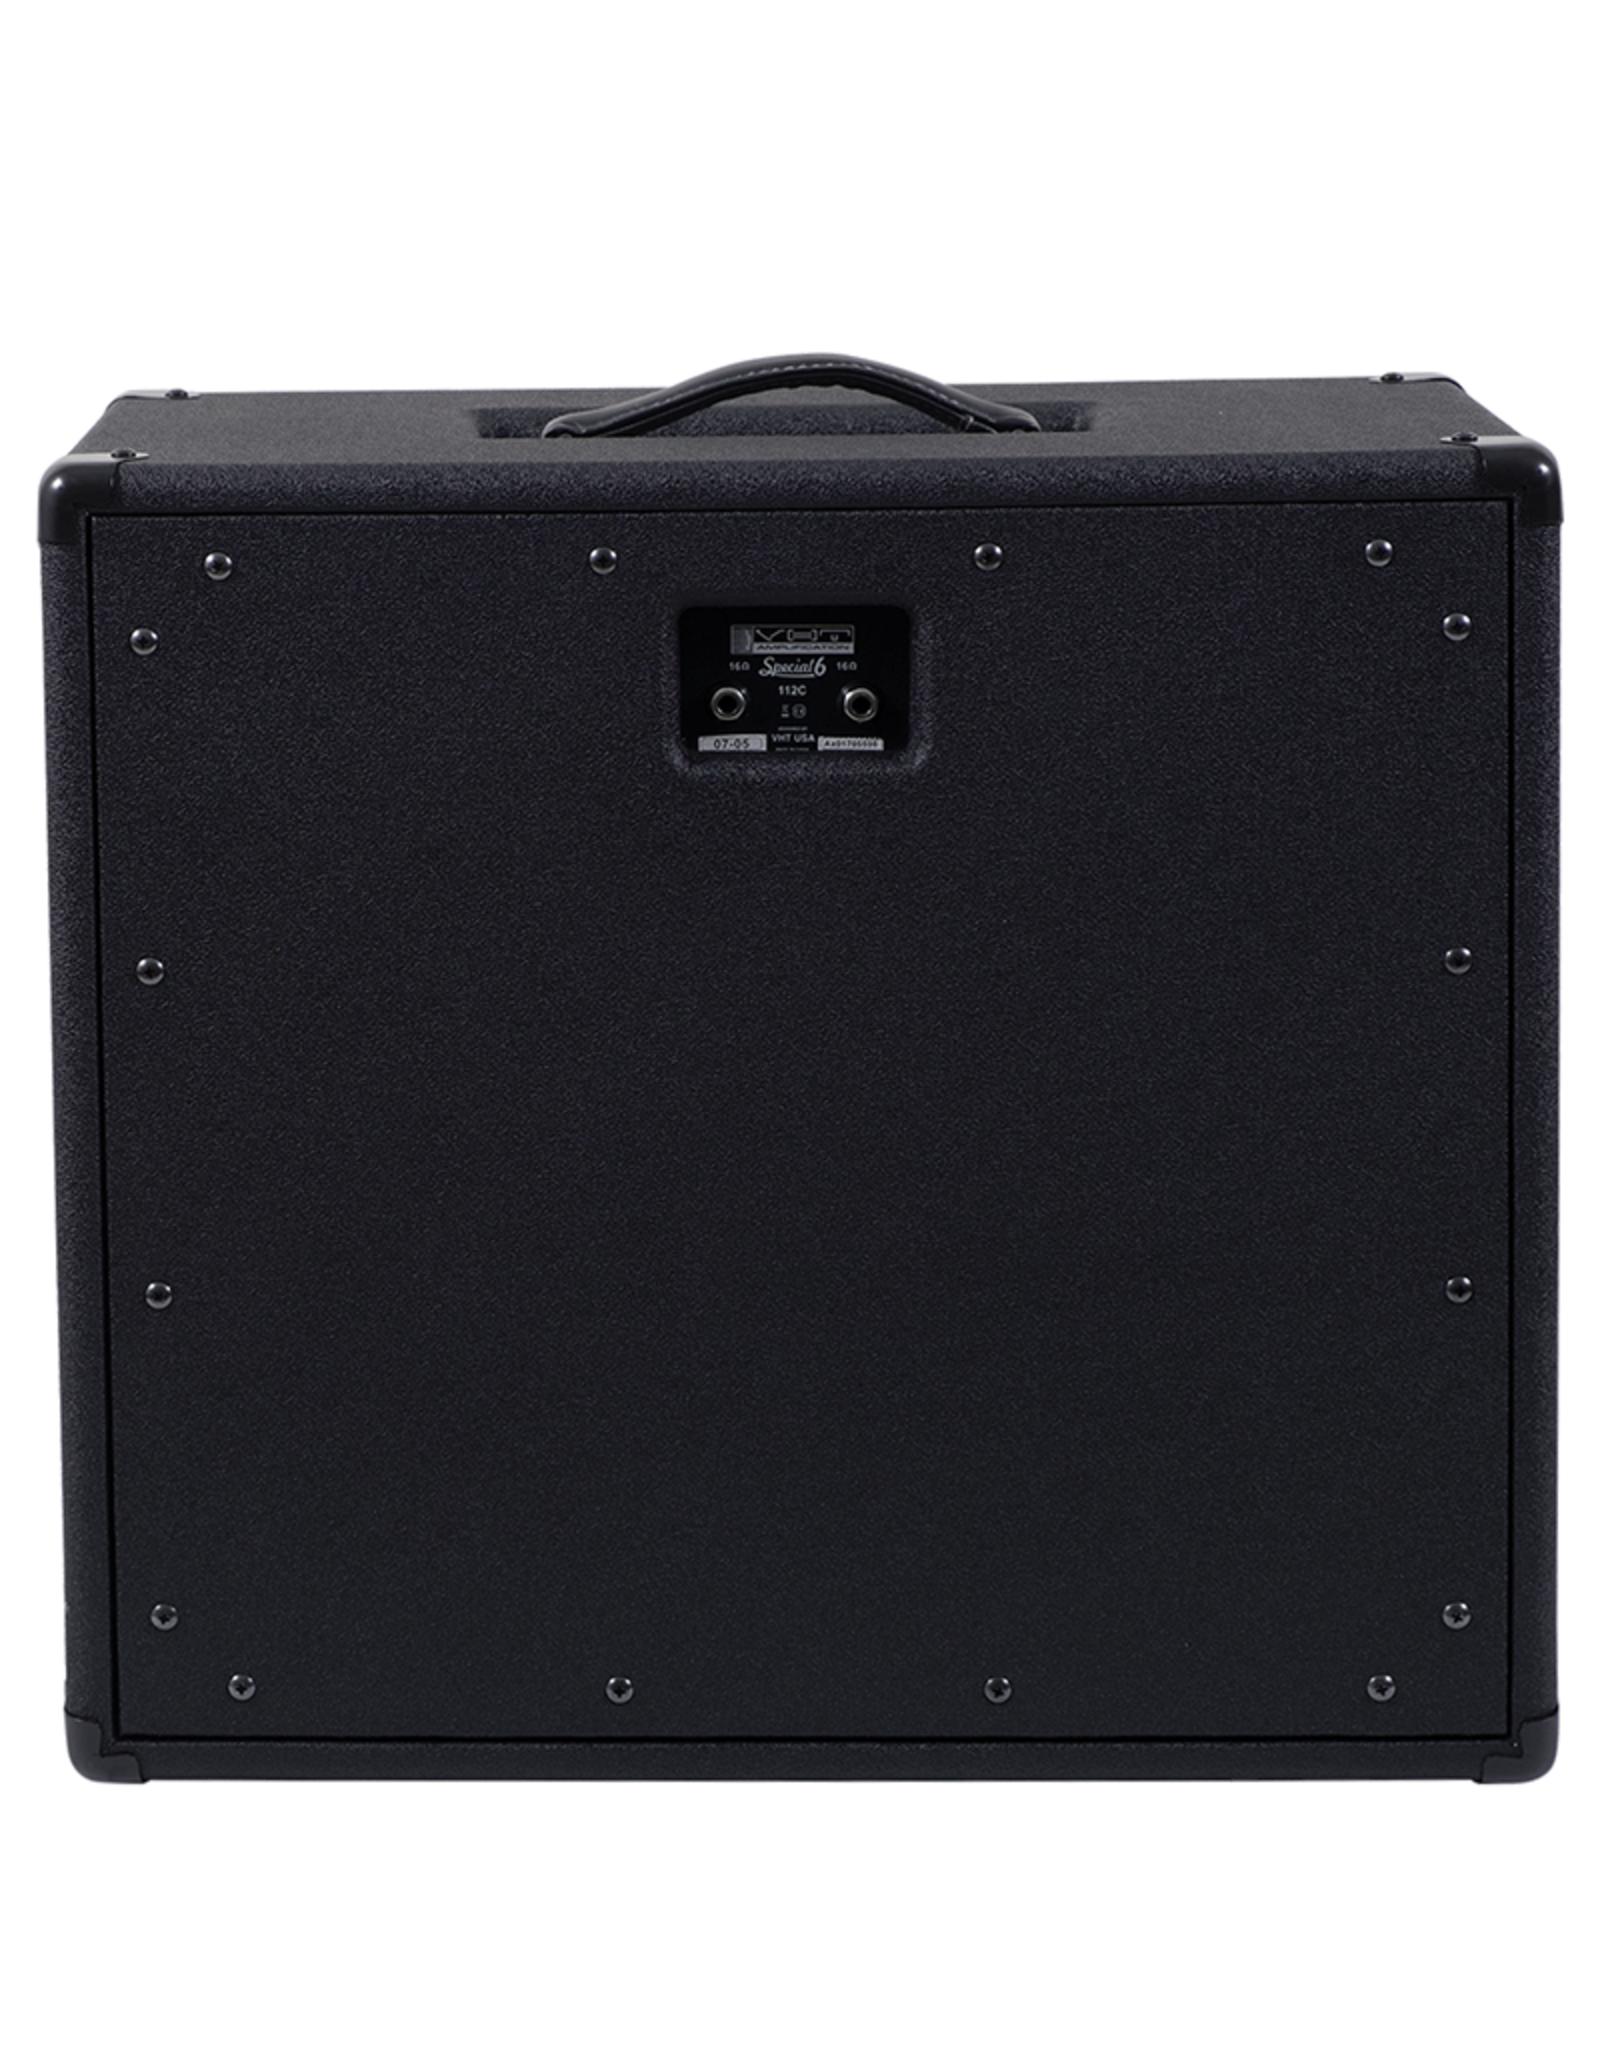 VHT VHT D-Series Cabinet